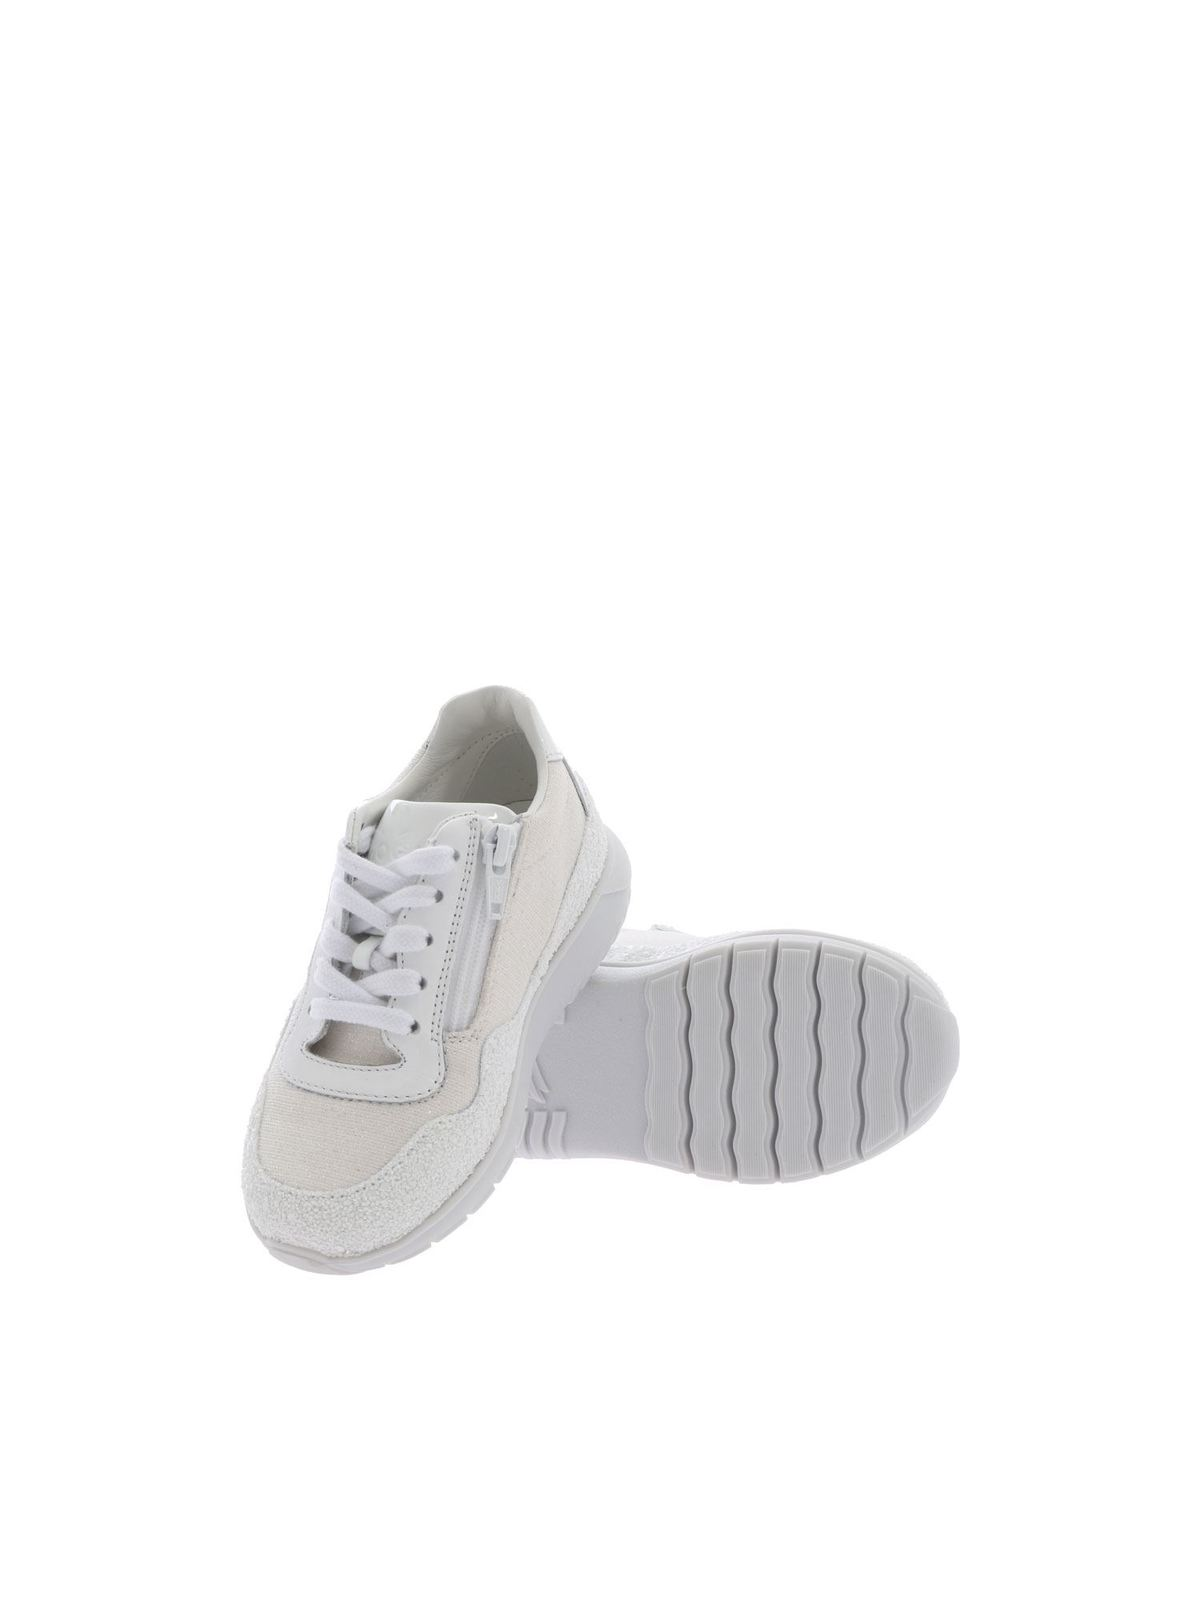 Hogan Junior - J371 sneakers in white glitter - trainers ...